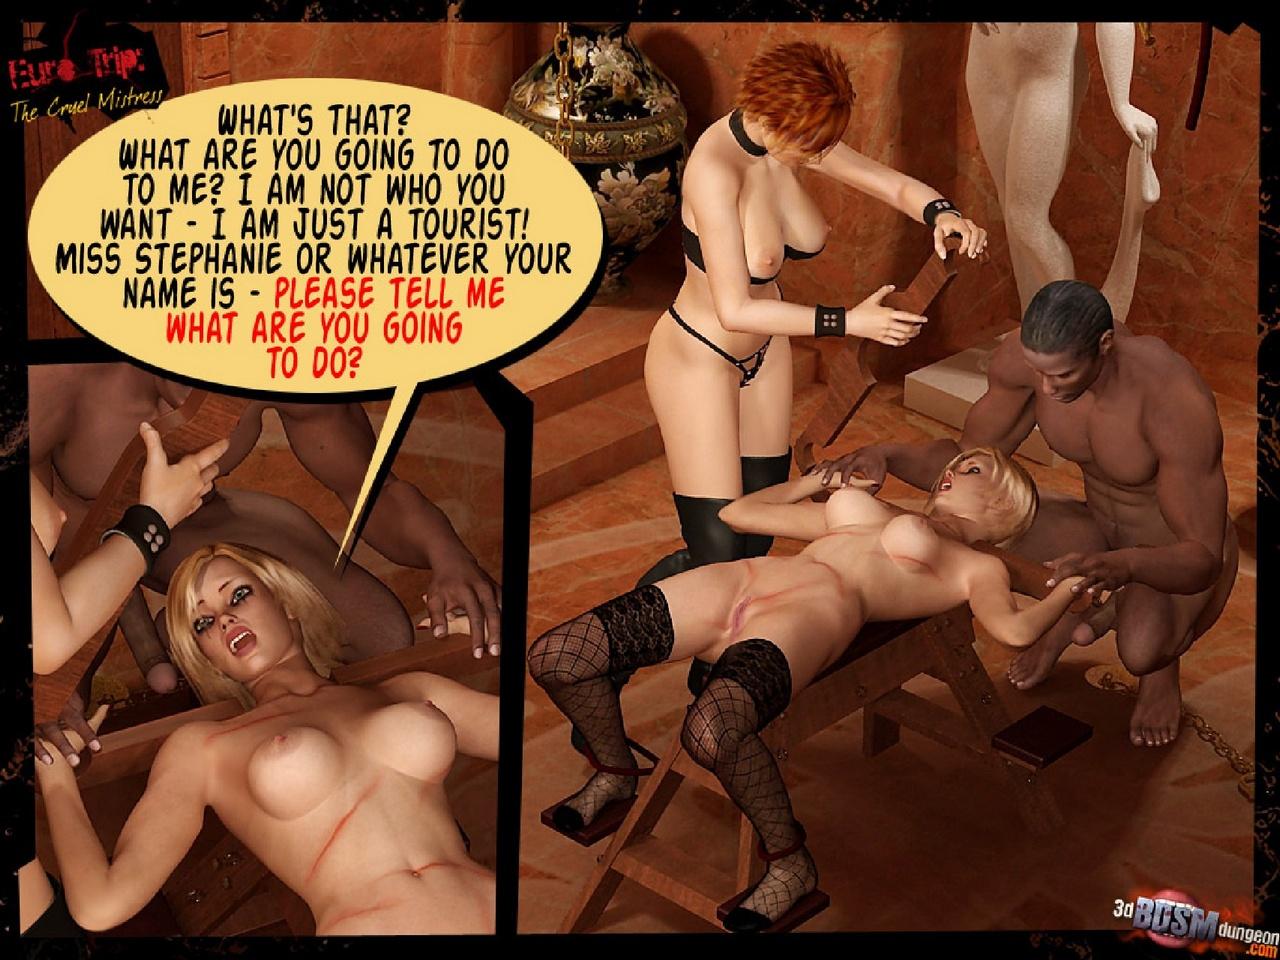 Euro Trip 3 - The Cruel Mistress - part 3